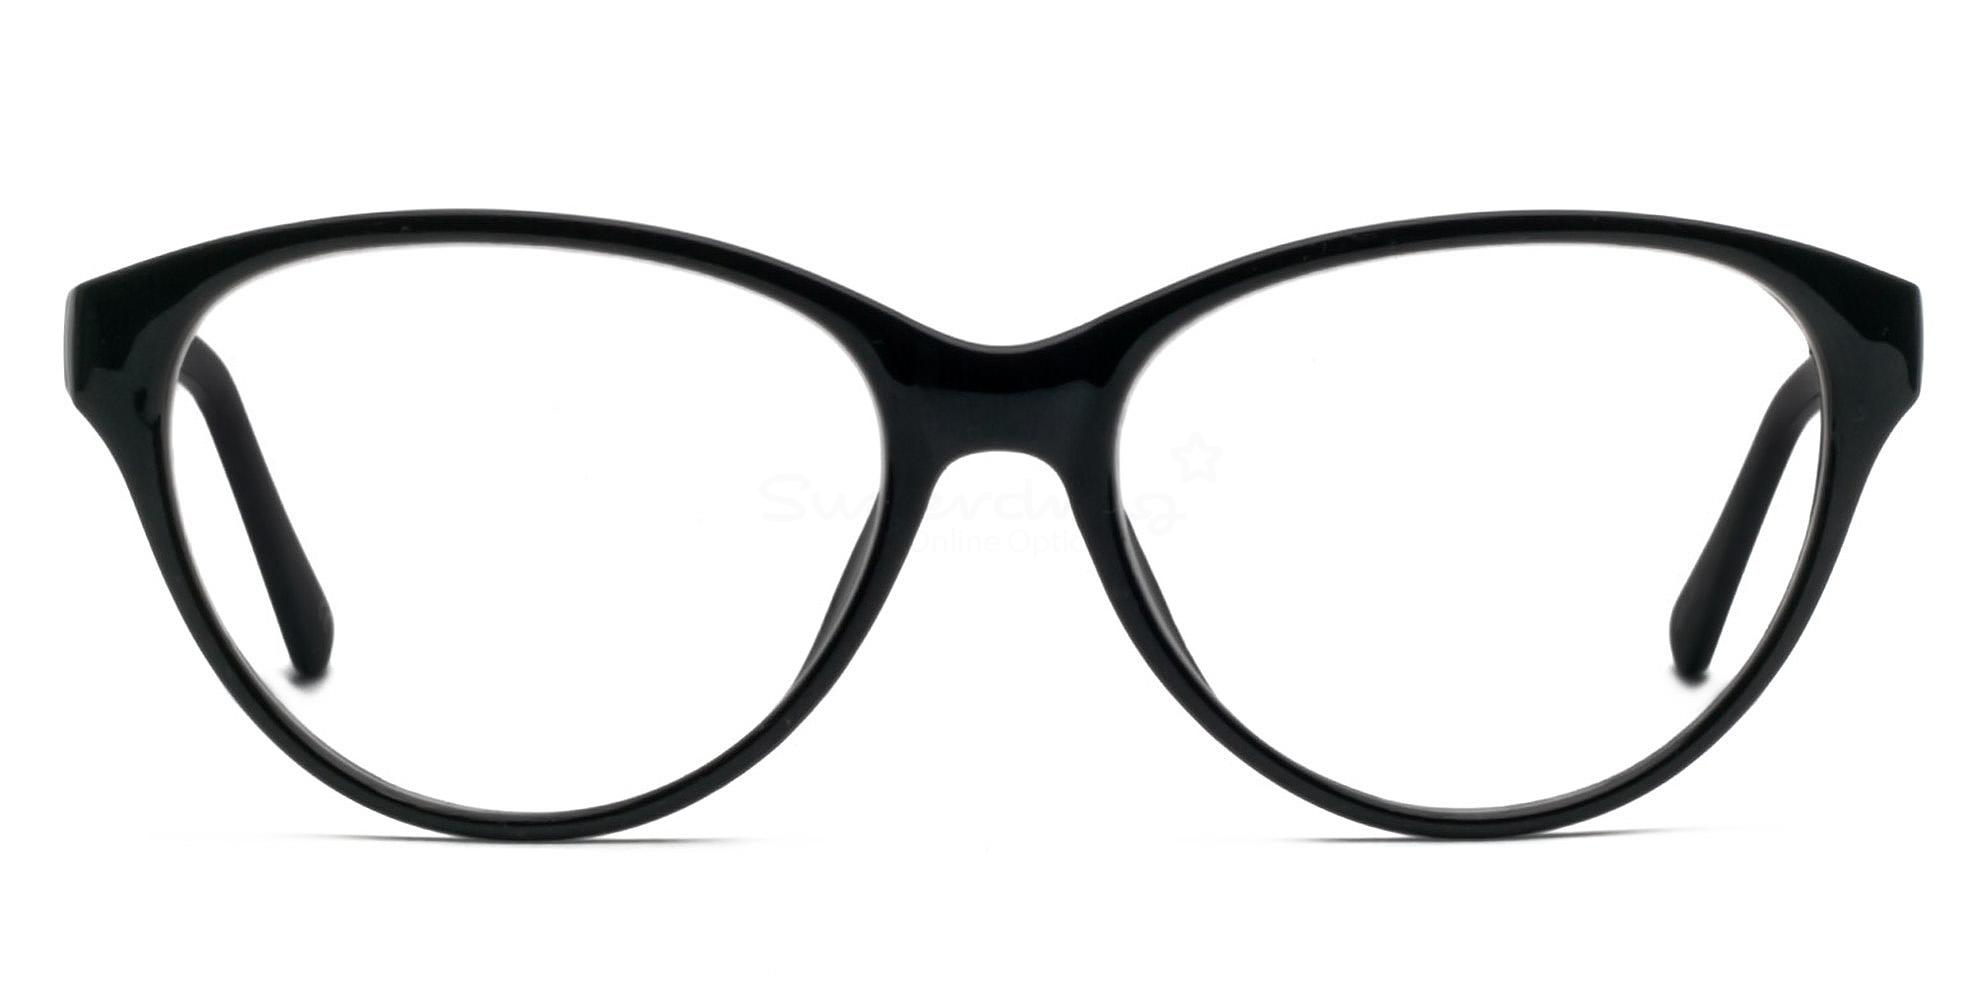 COL 01 2440 Glasses, Helium